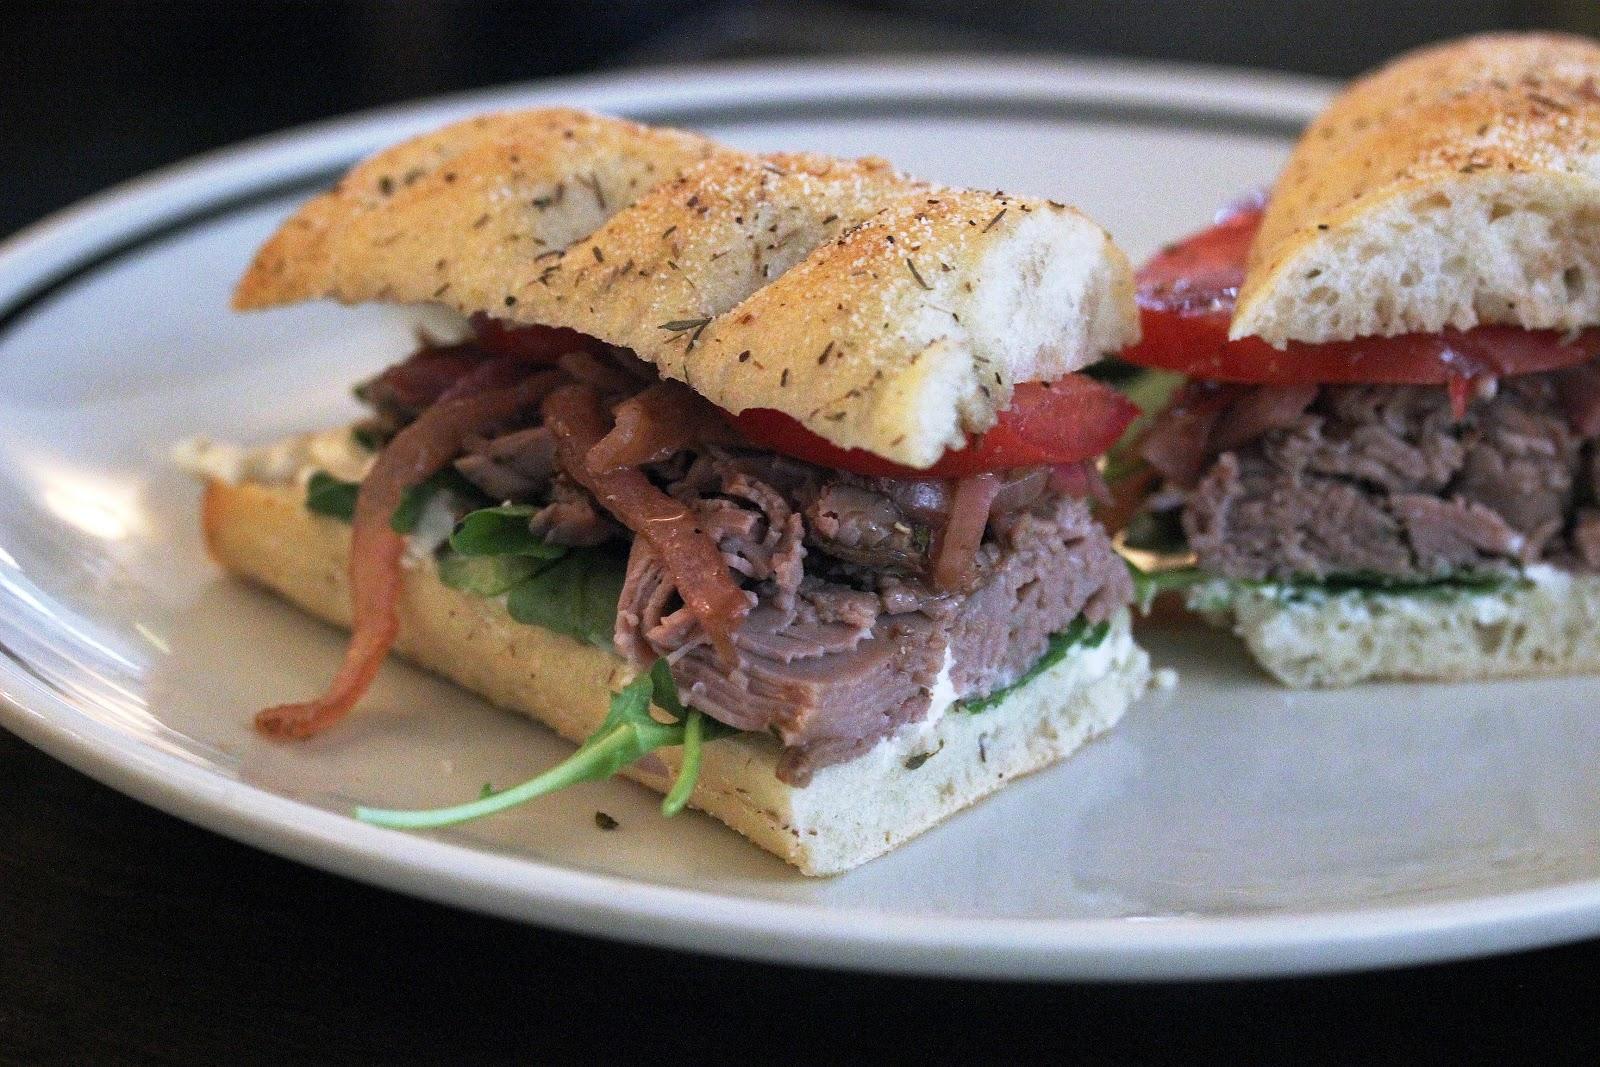 Tomato, Onion And Goat Cheese Sandwiches Recipes — Dishmaps